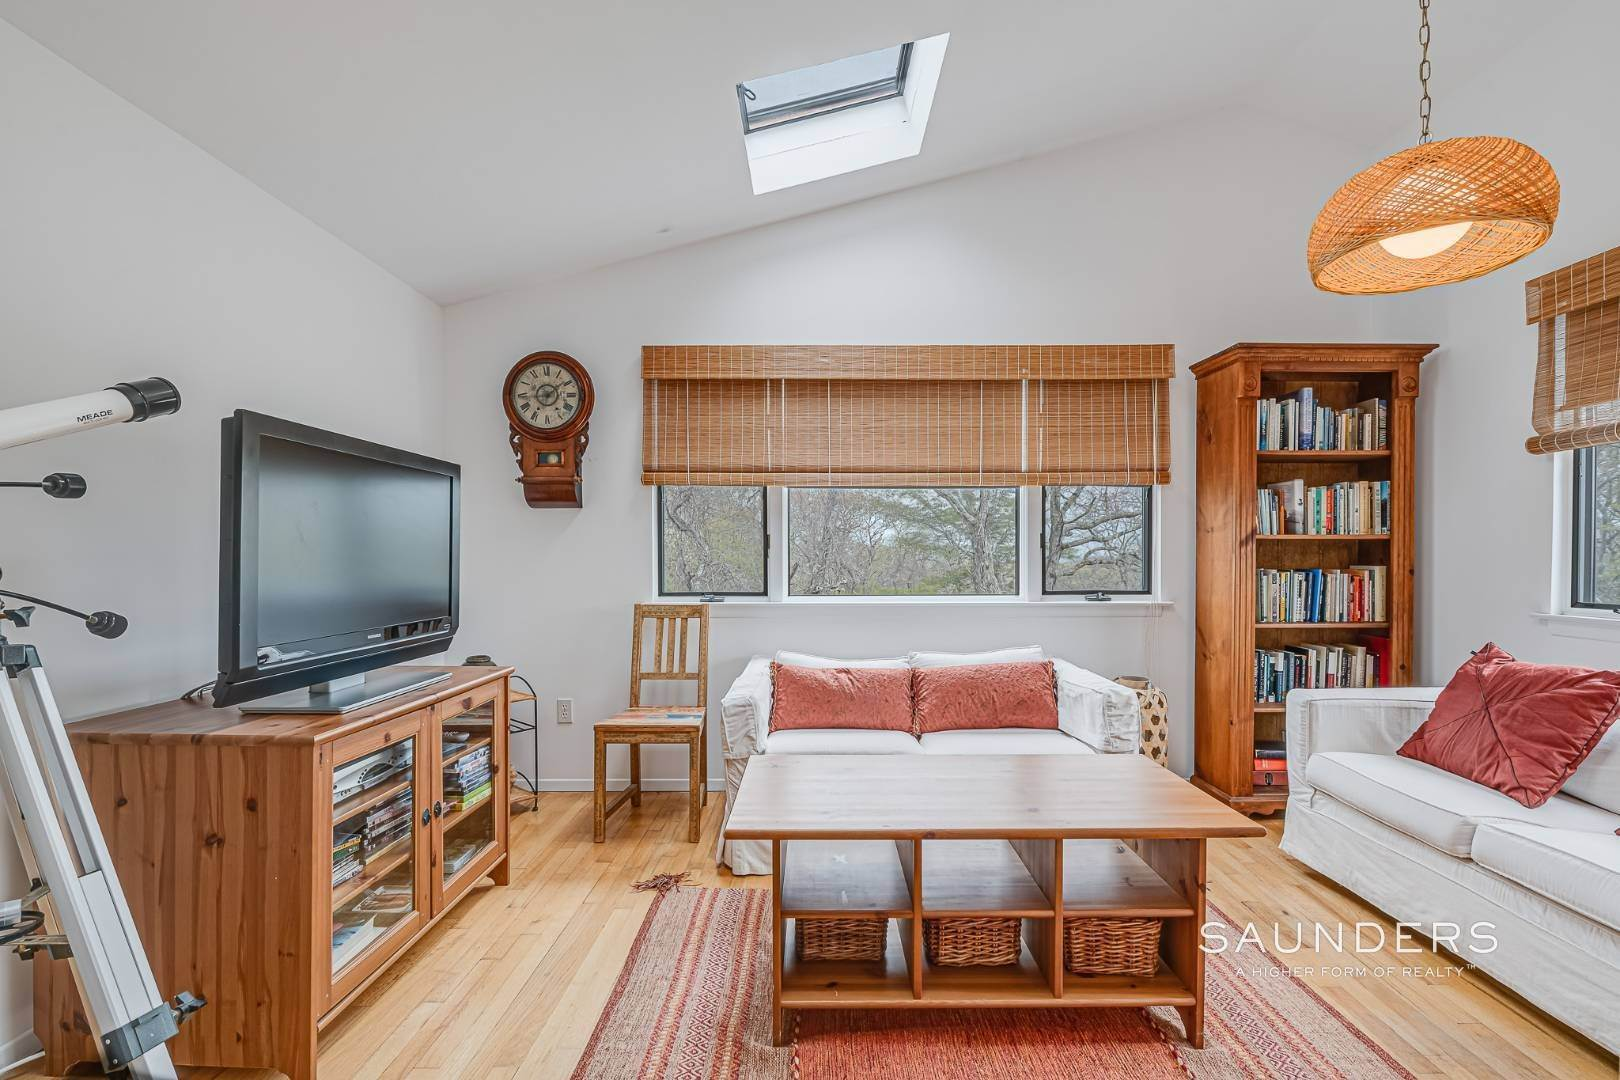 9. Single Family Homes for Sale at Montauk Beach House 8 Stuyvesant Drive, Montauk, East Hampton Town, NY 11954